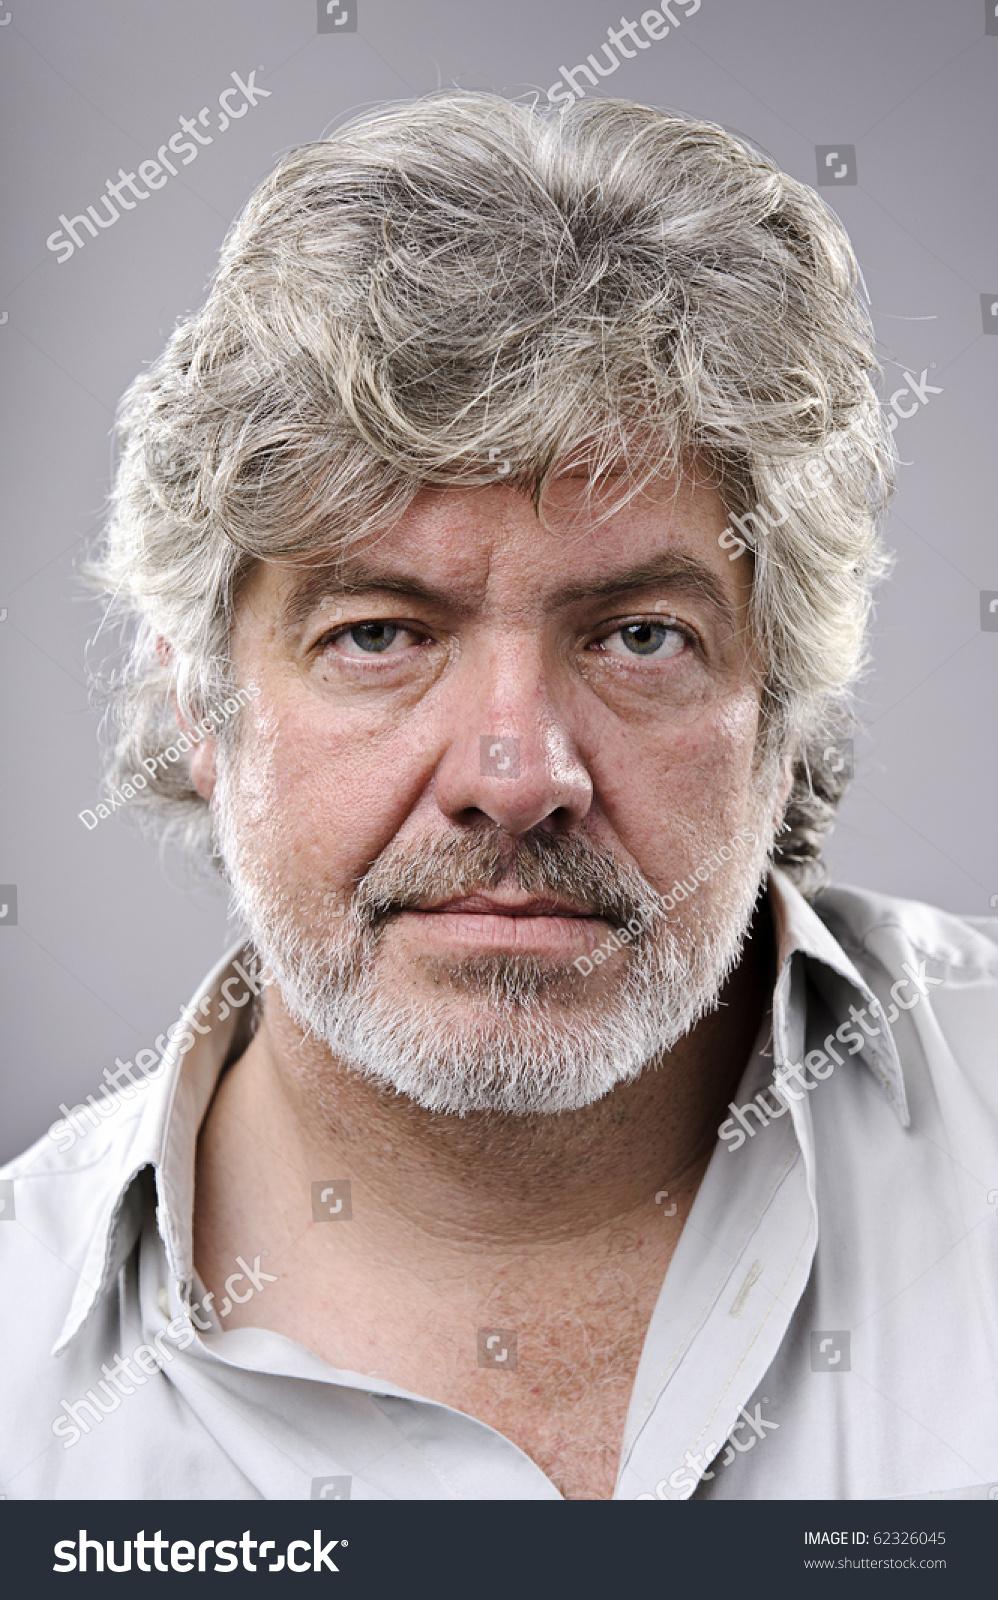 Old Man Grey Hair Wrinkled Skin Stock Photo Edit Now 62326045